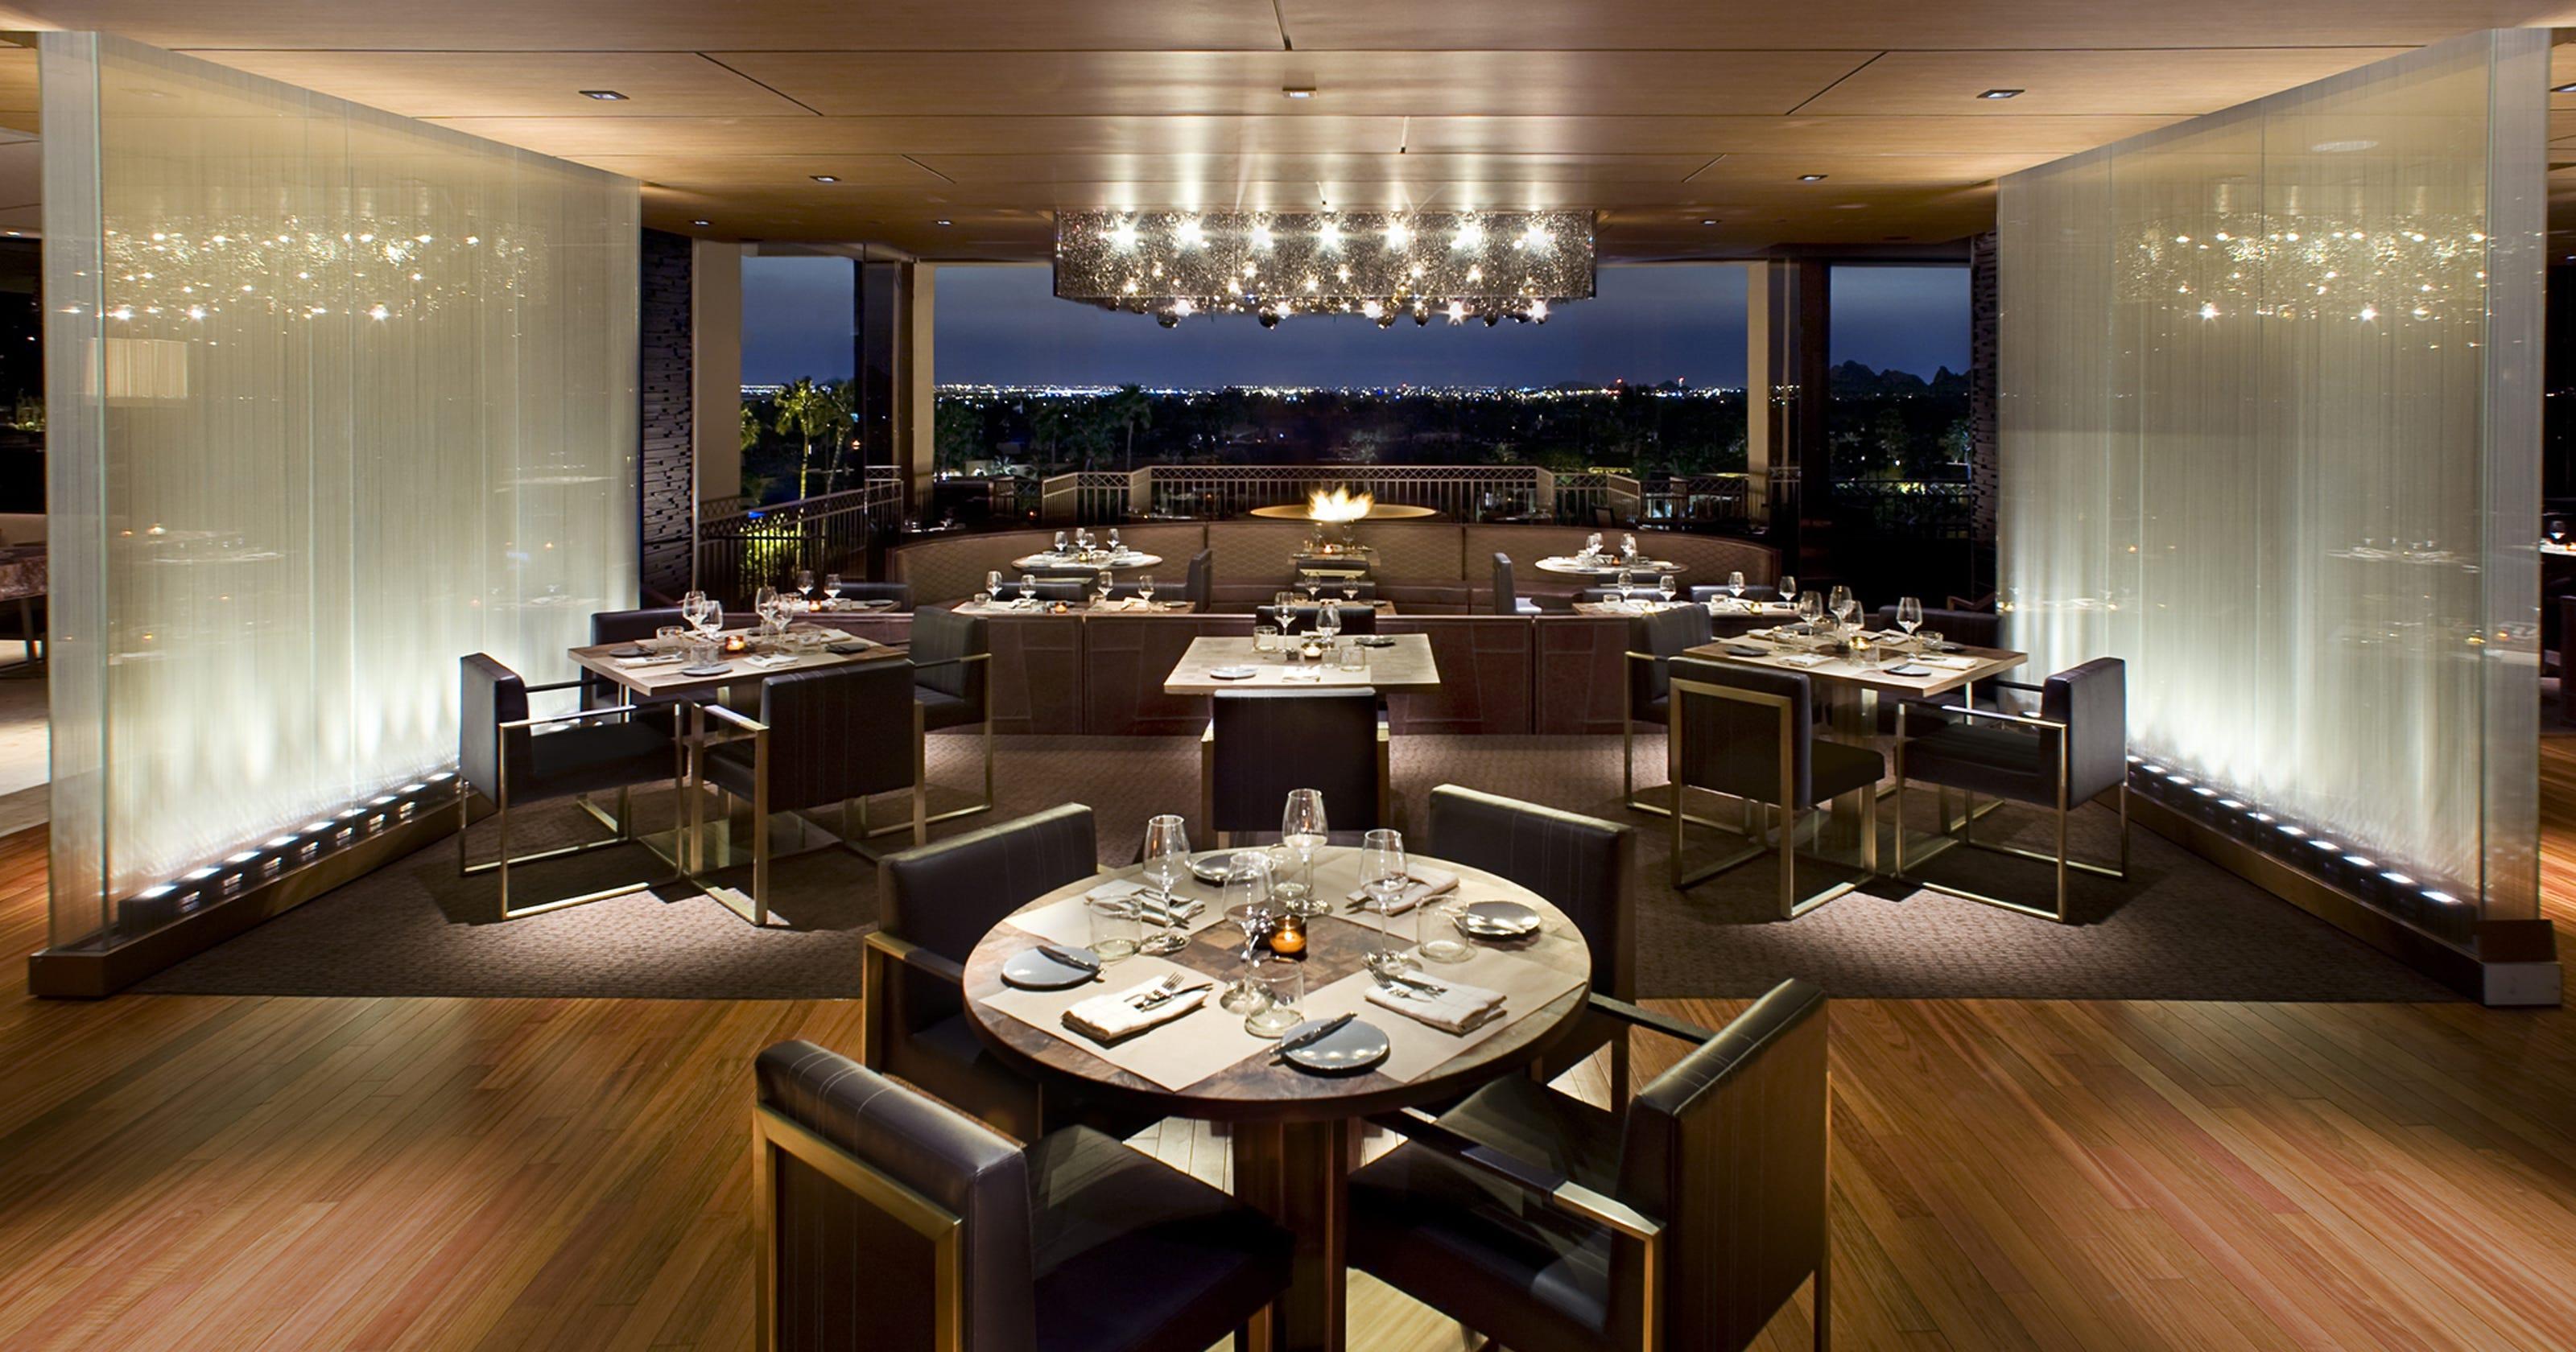 33 restaurants for New Year\'s Eve dinner across metro Phoenix